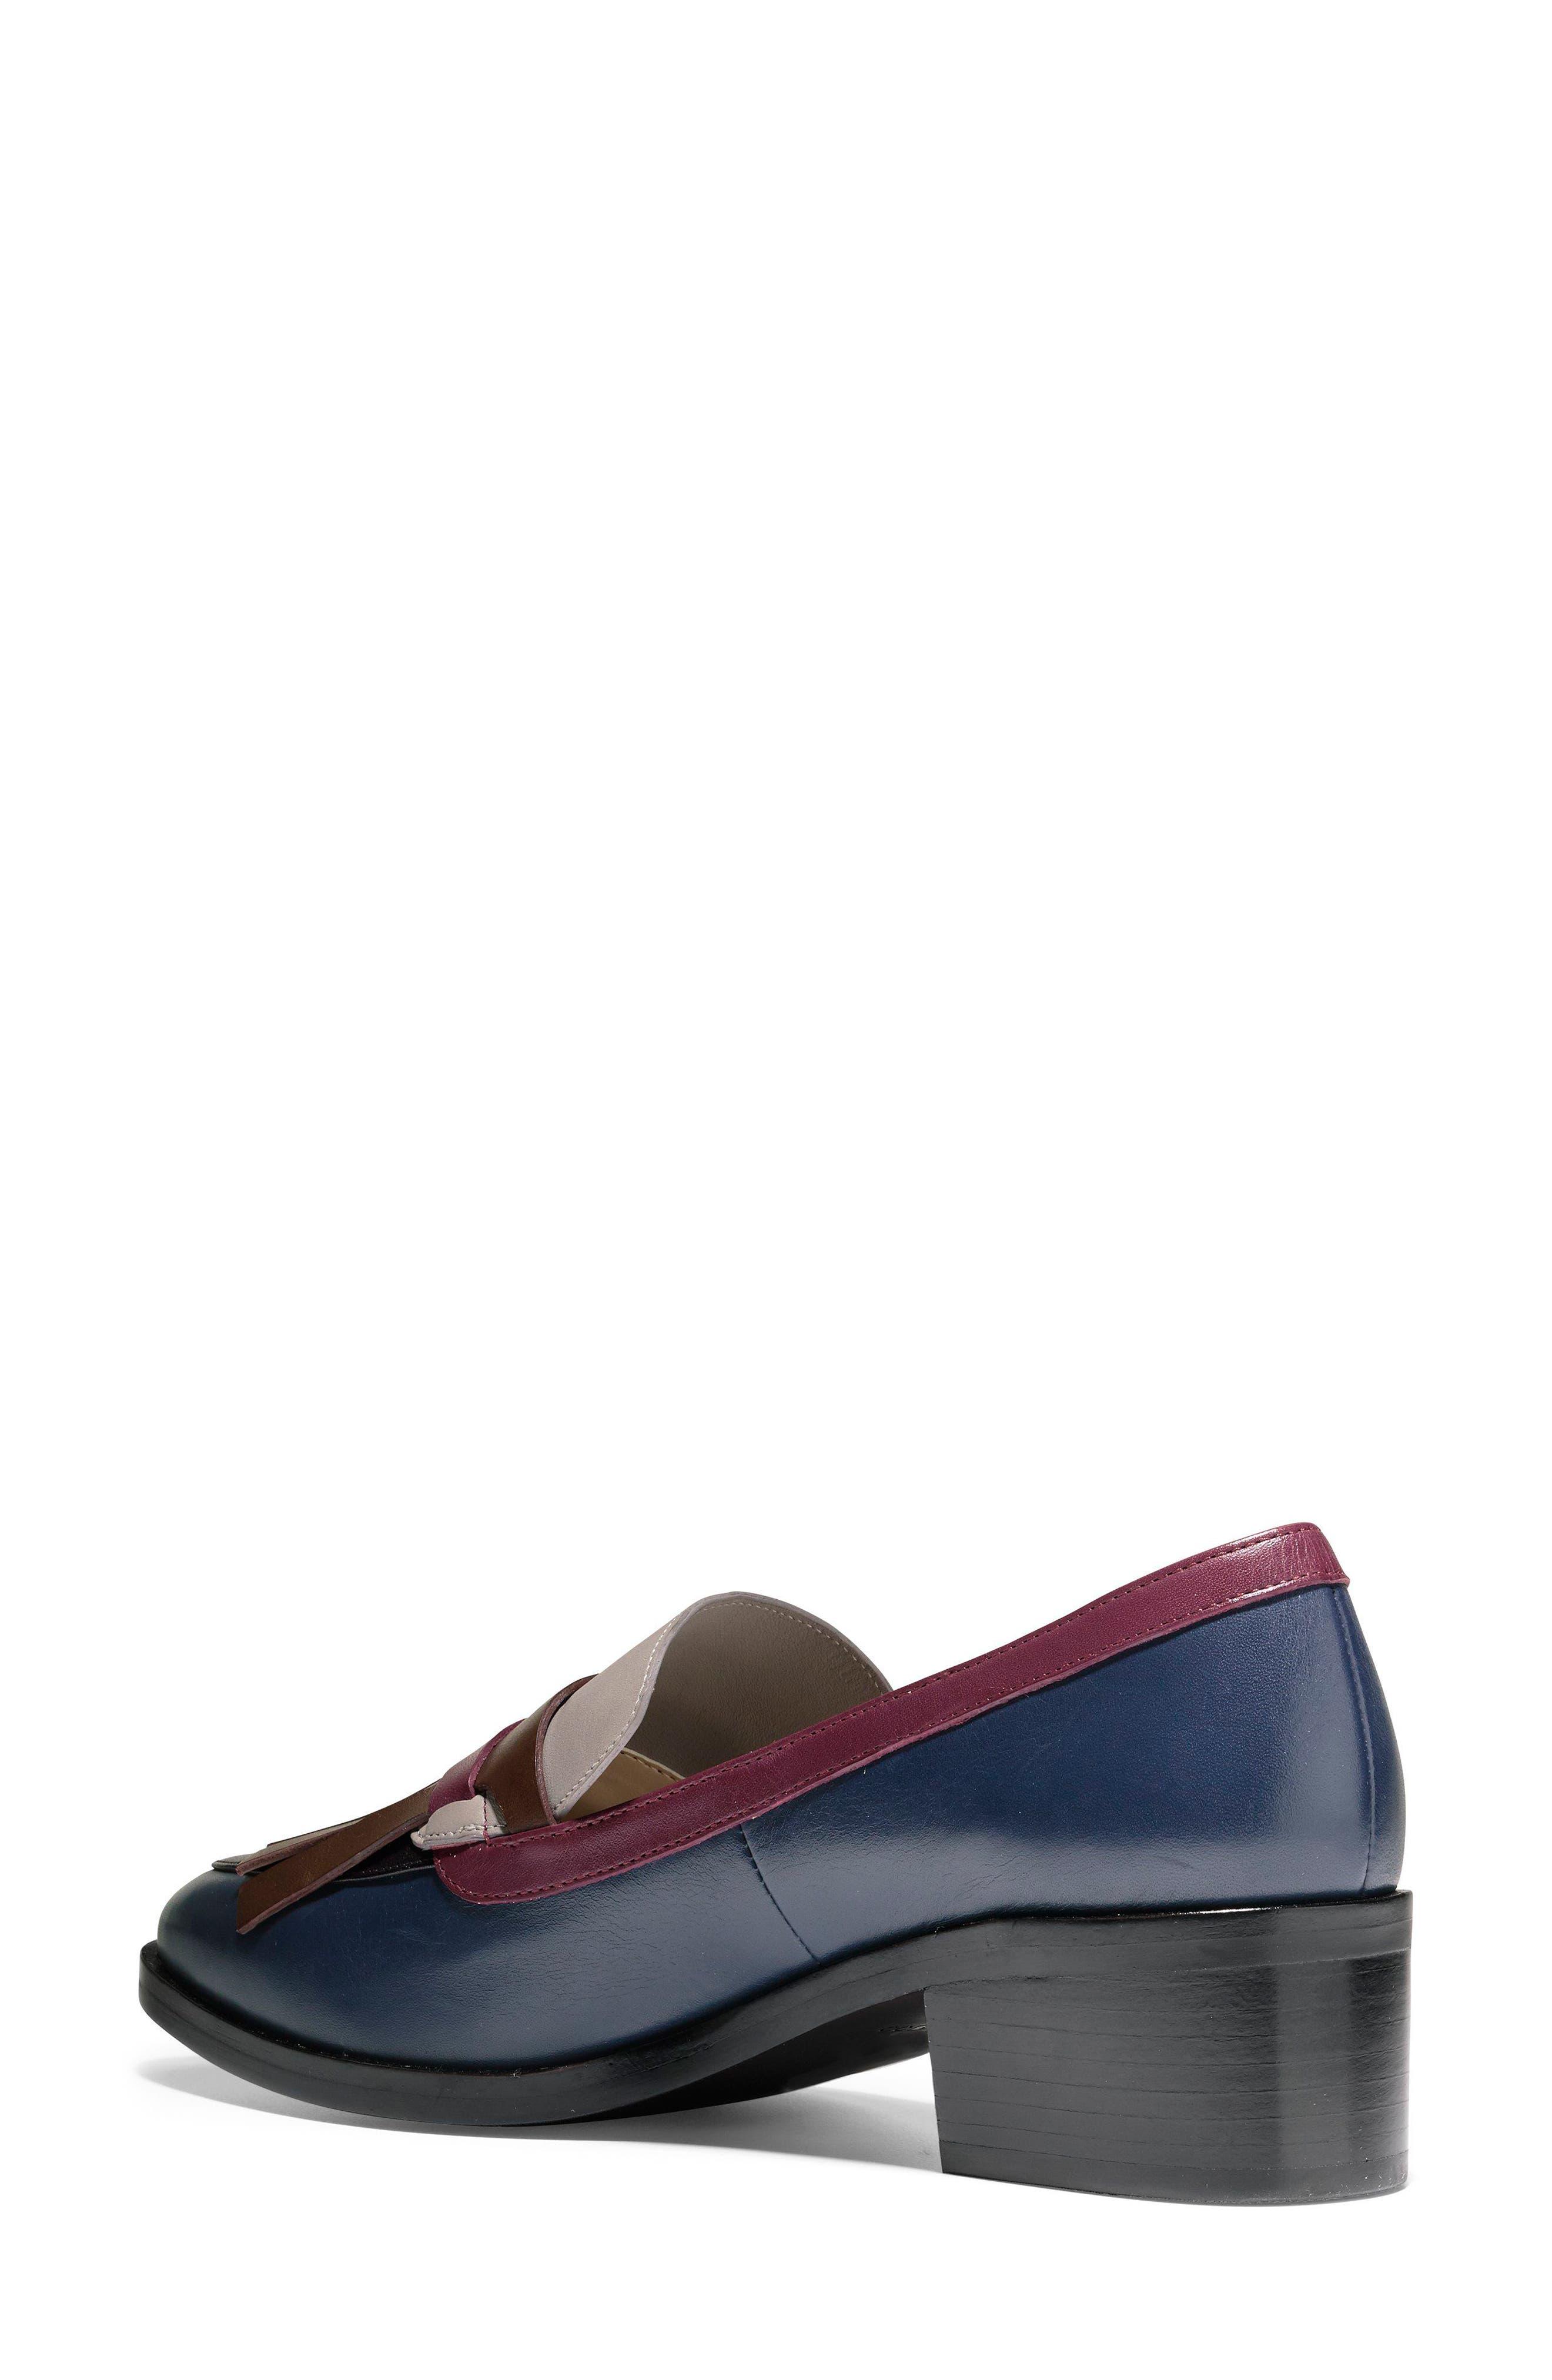 Margarite Loafer Pump,                             Alternate thumbnail 2, color,                             Marine Blue Leather